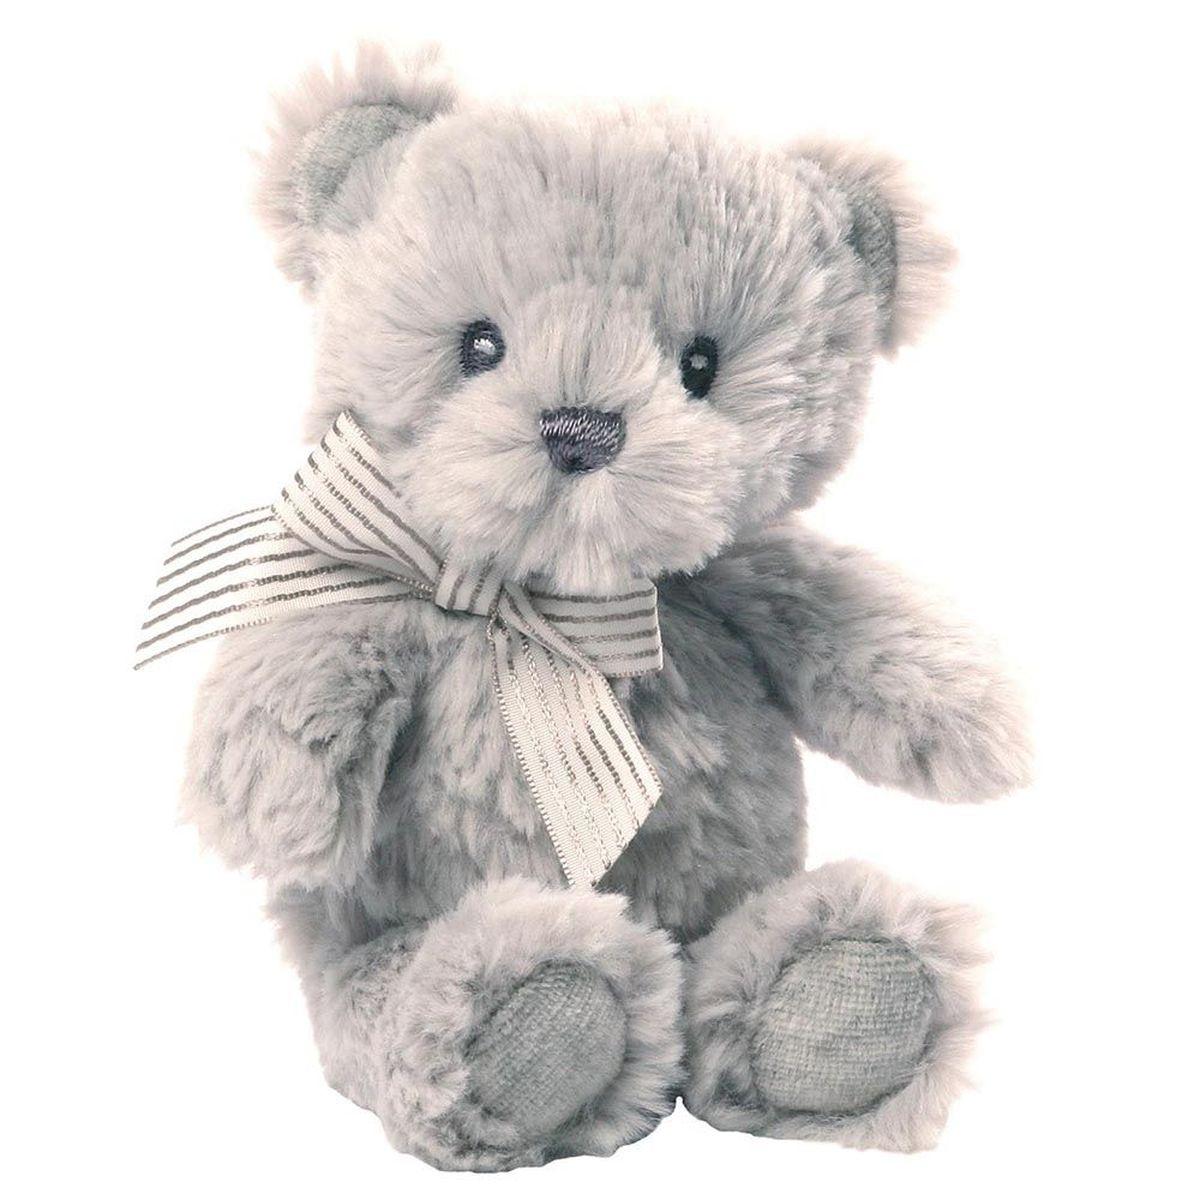 Gund Мягкая игрушка Grayson Bear Rattle 15 см gund мягкая игрушка arlo bear 18 см